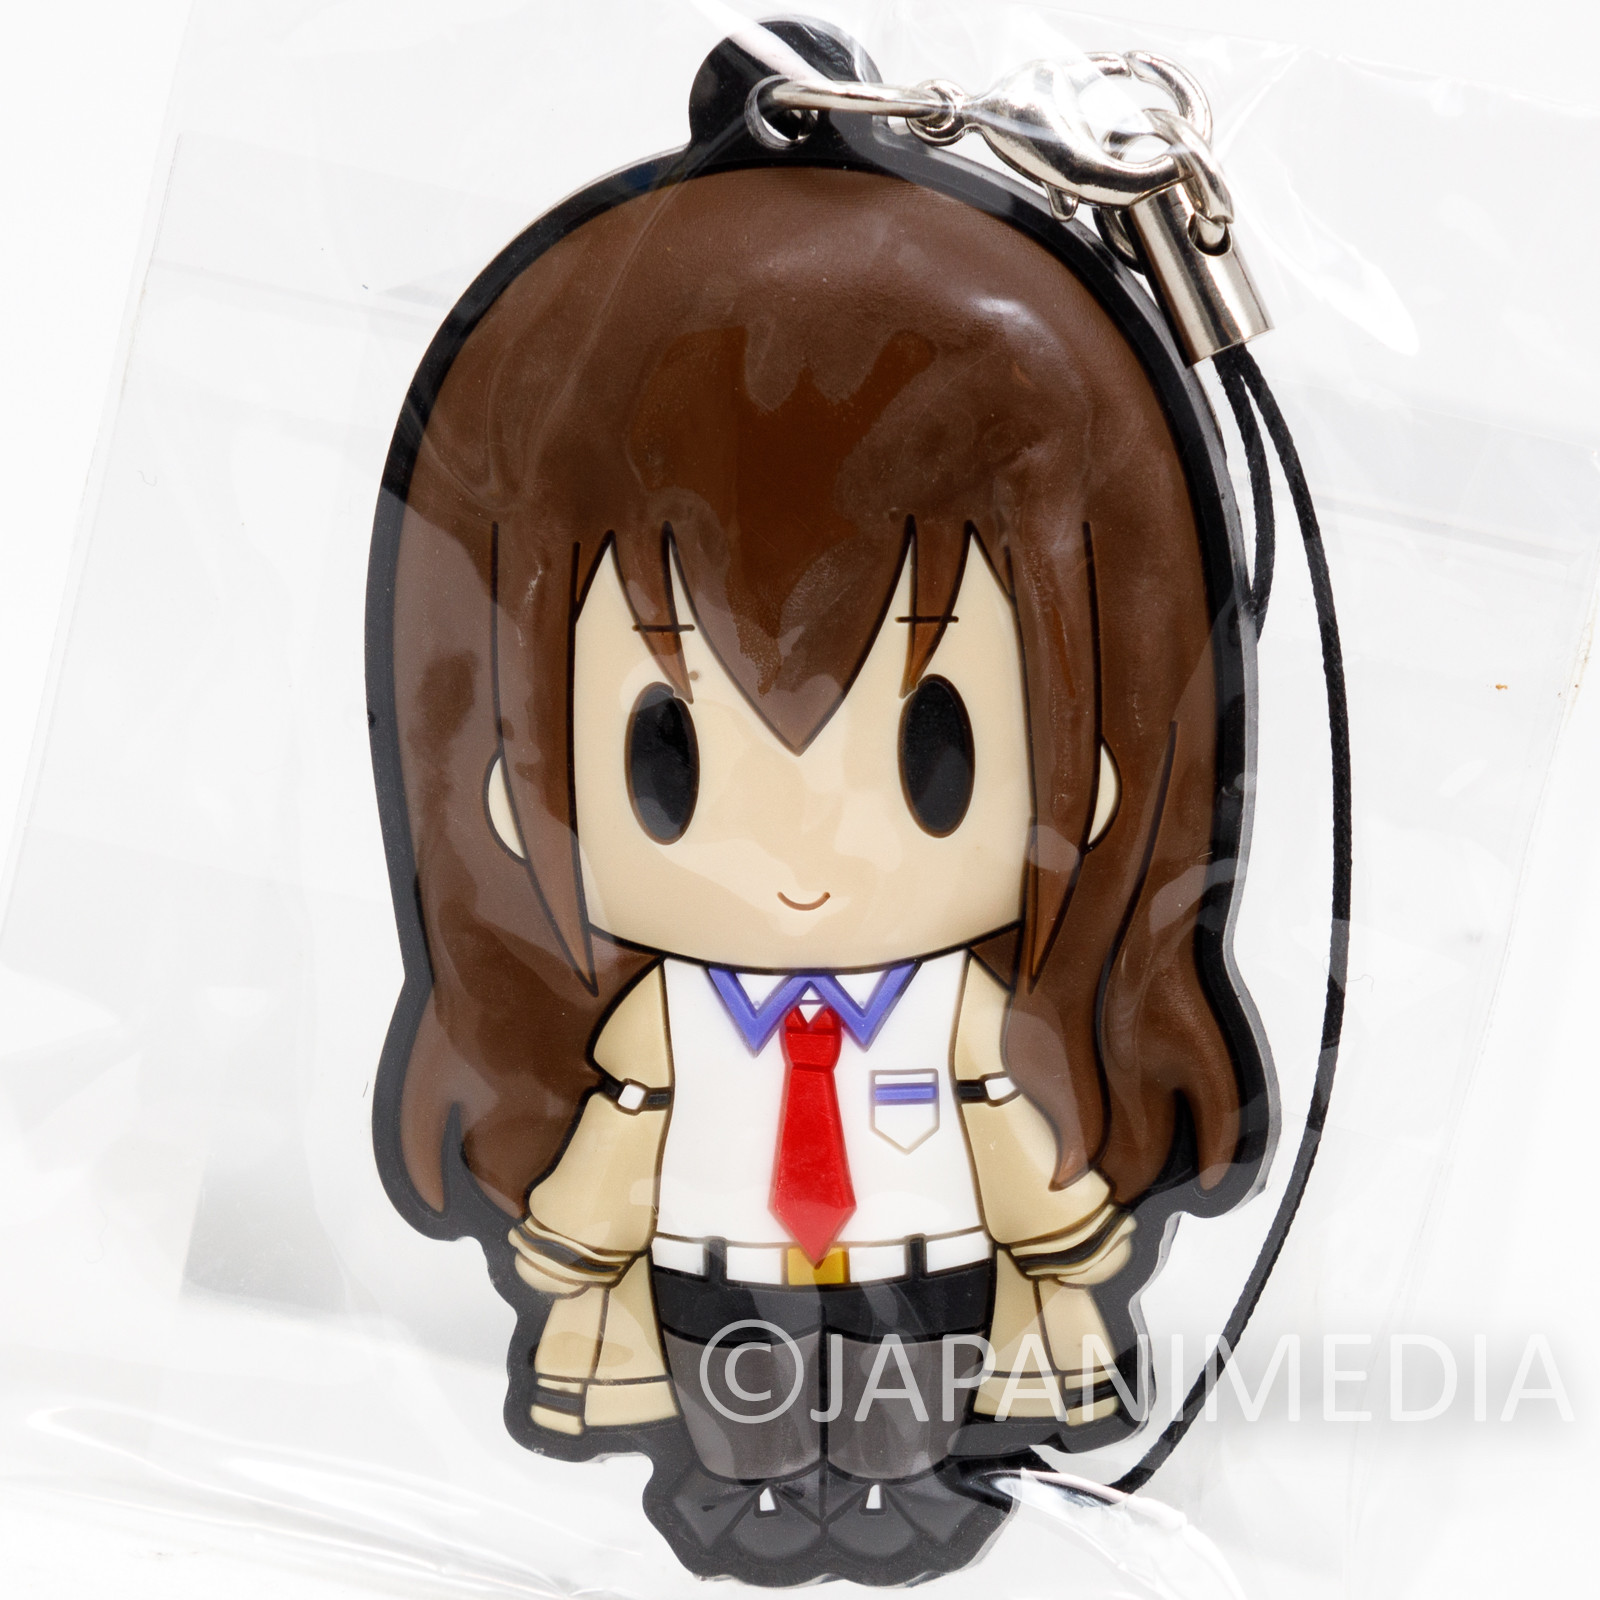 Steins ; Gate Kurisu Makise Mascot Rubber Strap JAPAN ANIME